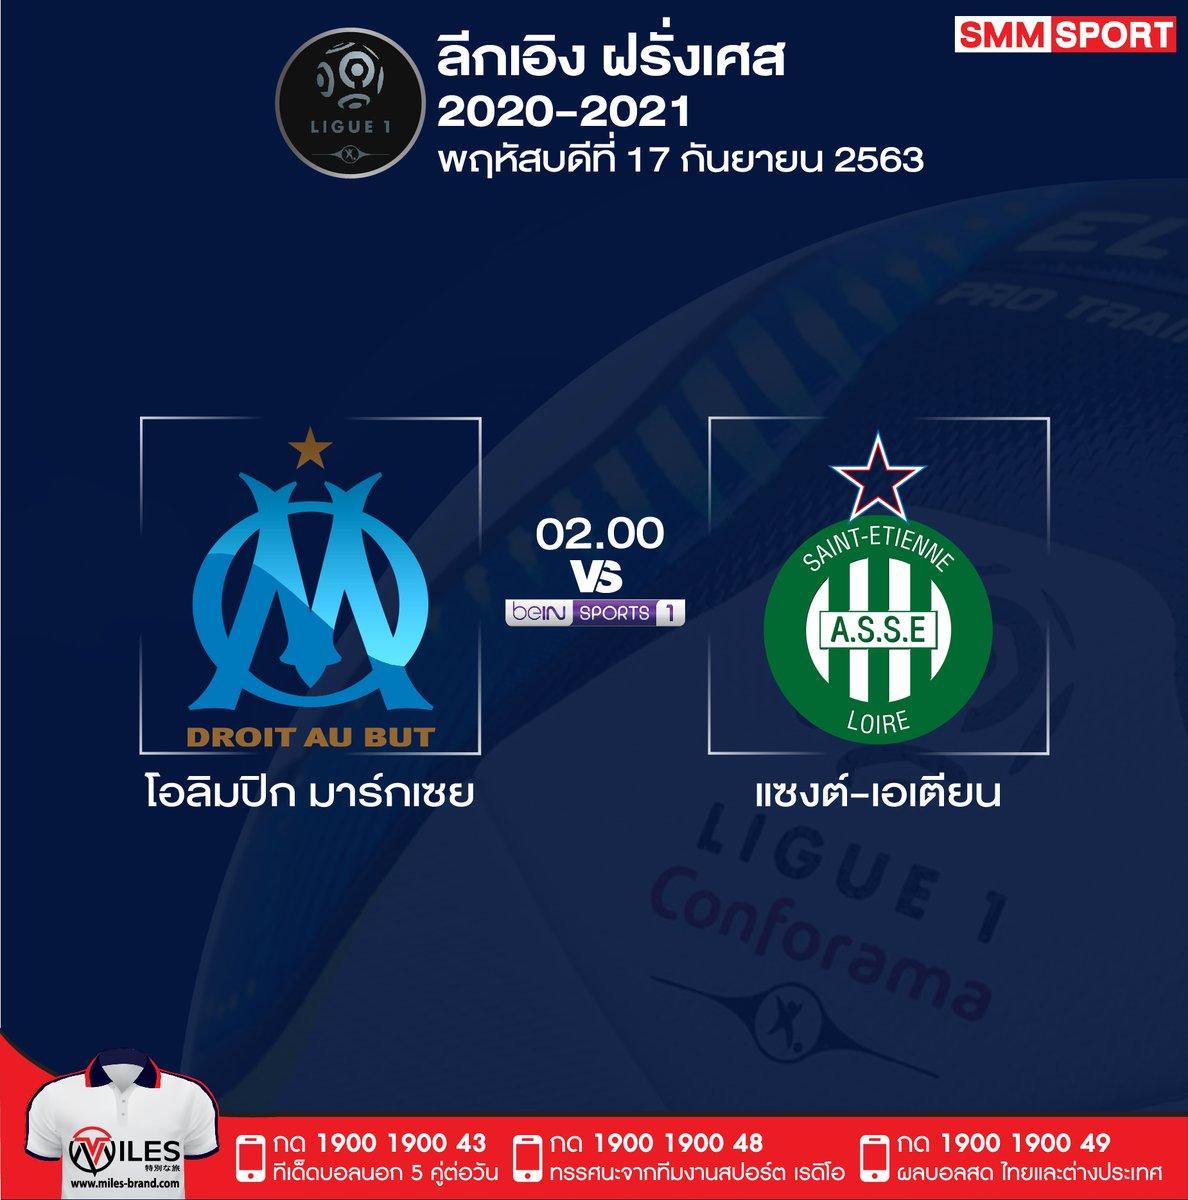 ⚽ #Ligue1 🇫🇷   แซงต์-เอเตียน ทีมอันดับ 4 ของตาราง ออกสตาร์ทด้วยการชนะ 2 นัดติด บุกเยือน โอลิมปิก มาร์กเซย หวังเก็บชัยต่อเนื่องนัดที่ 3    📱 ผลบอลสด คลิก>>> https://t.co/JFgo5zW6ha   #SMMSPORT #ลีกเอิง #มาร์กเซย #แซงต์เอเตียน https://t.co/bmUgpMMCHa